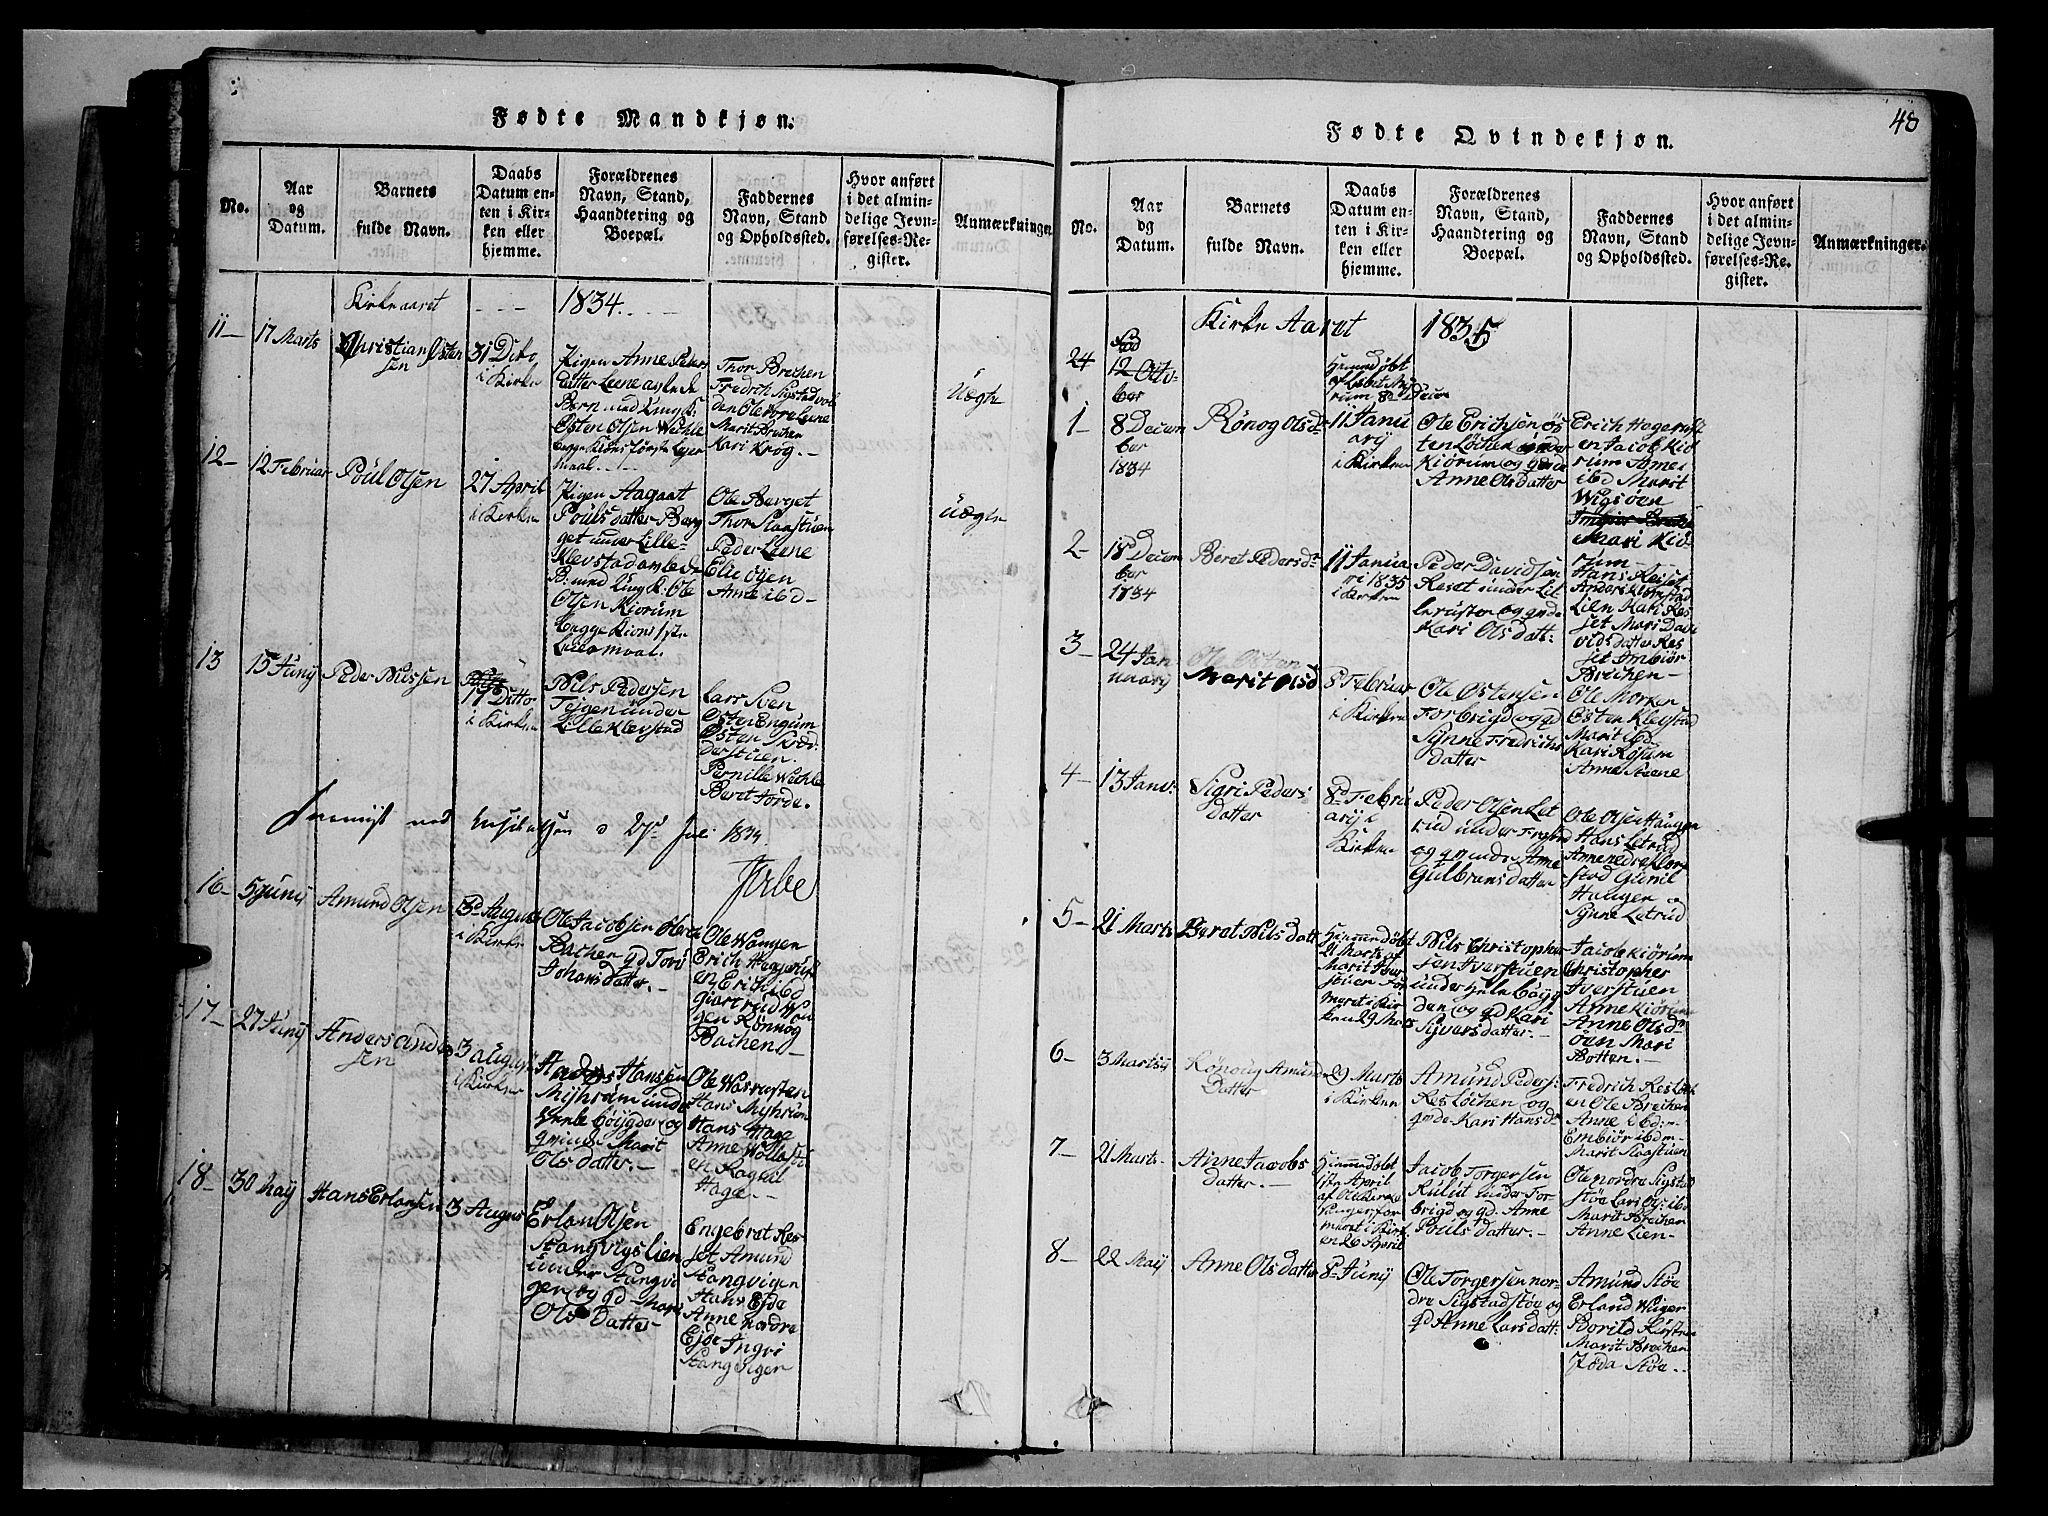 SAH, Fron prestekontor, H/Ha/Hab/L0002: Klokkerbok nr. 2, 1816-1850, s. 48